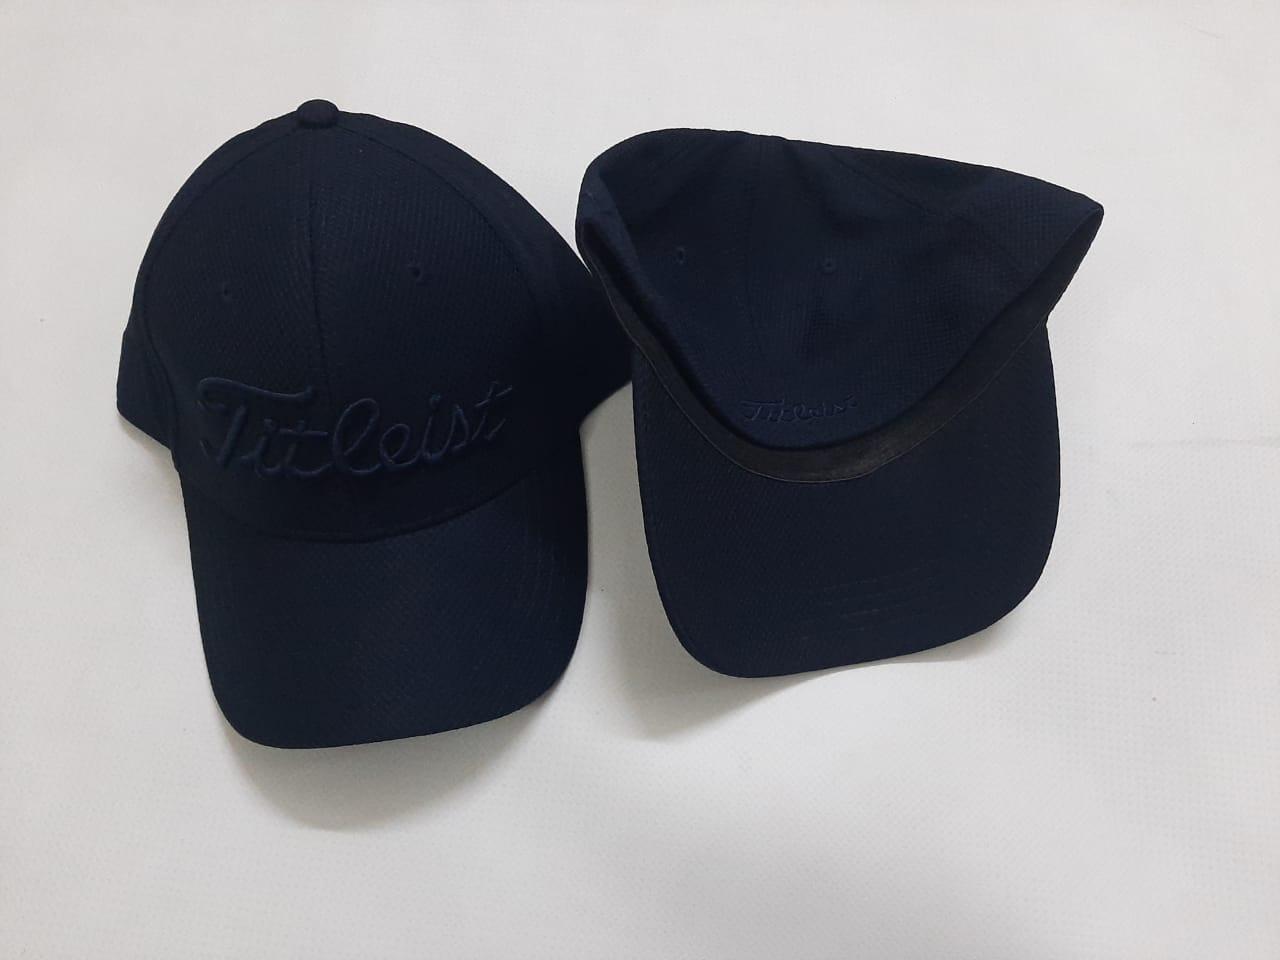 TITLEIST BRAND NEW CAPS